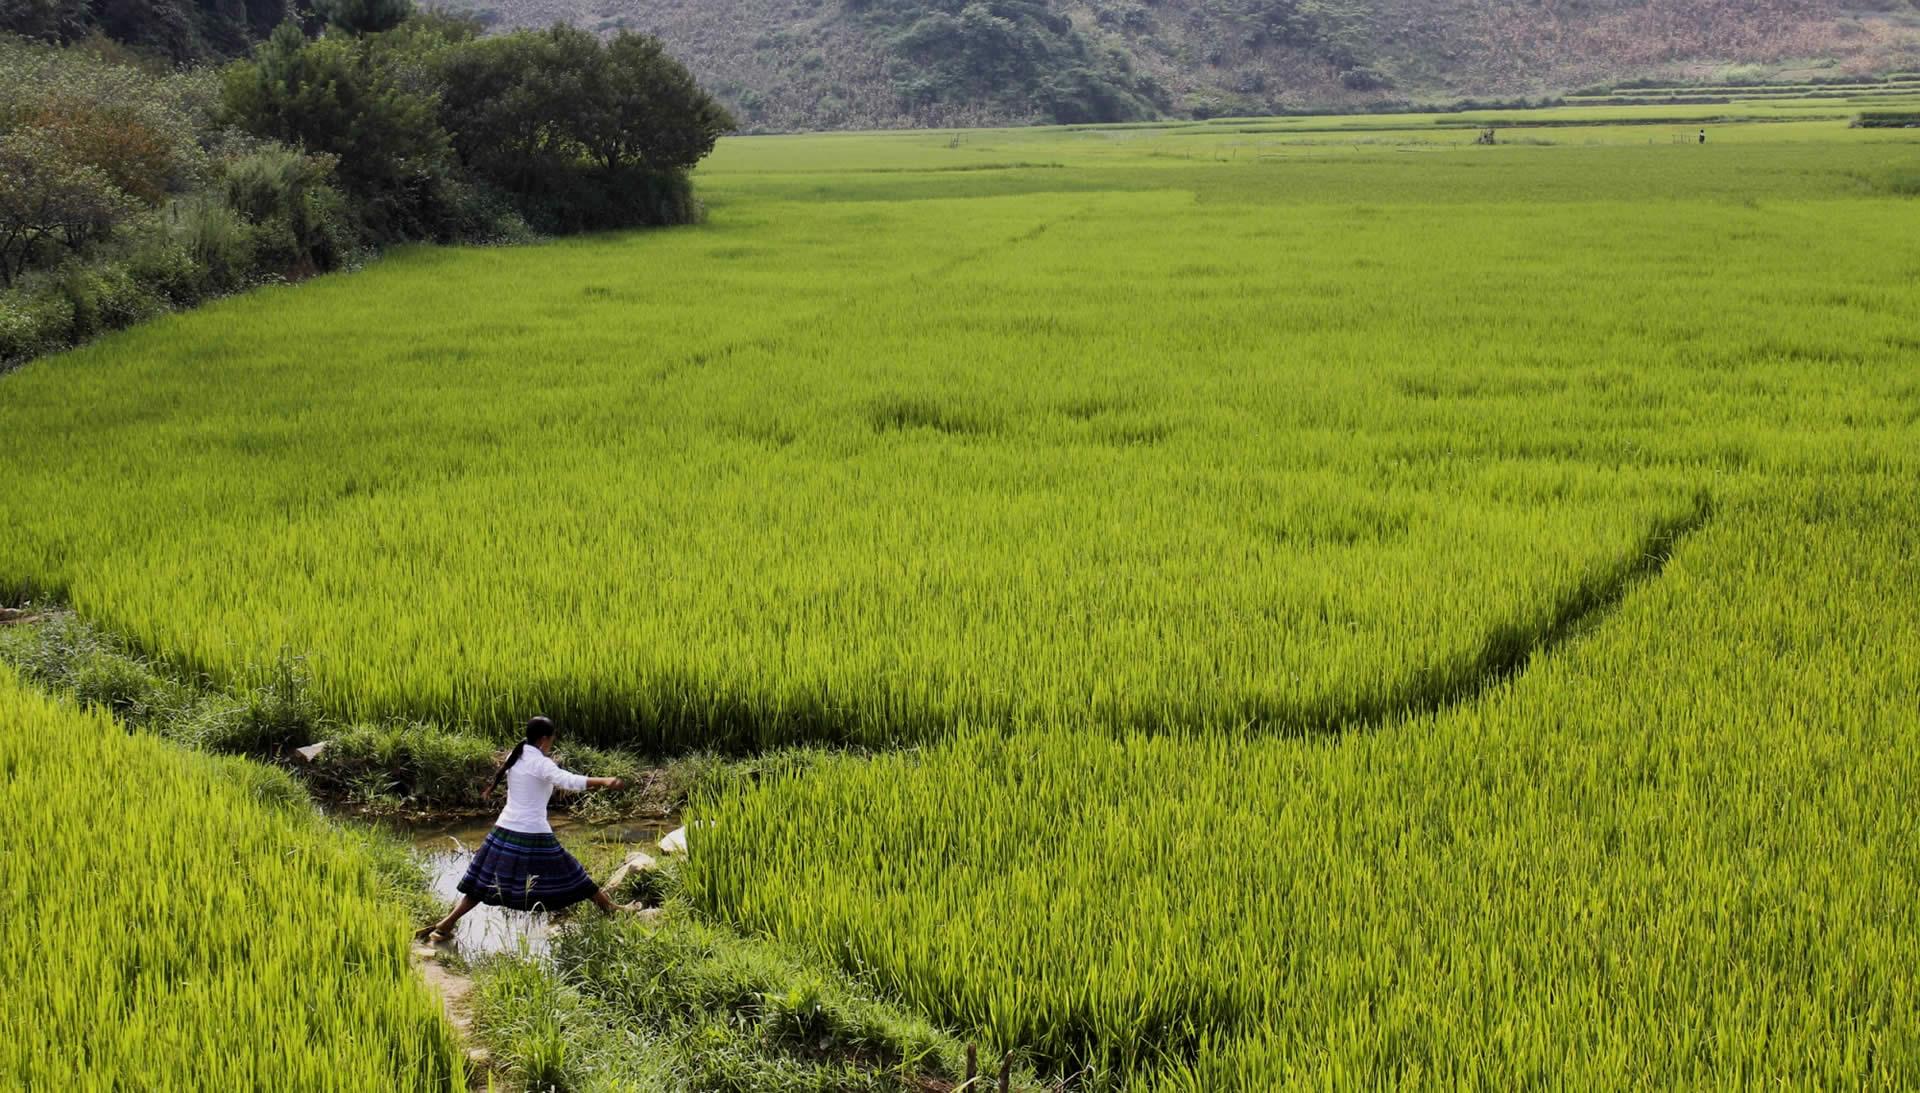 The Asia Foundation - Scenic photo